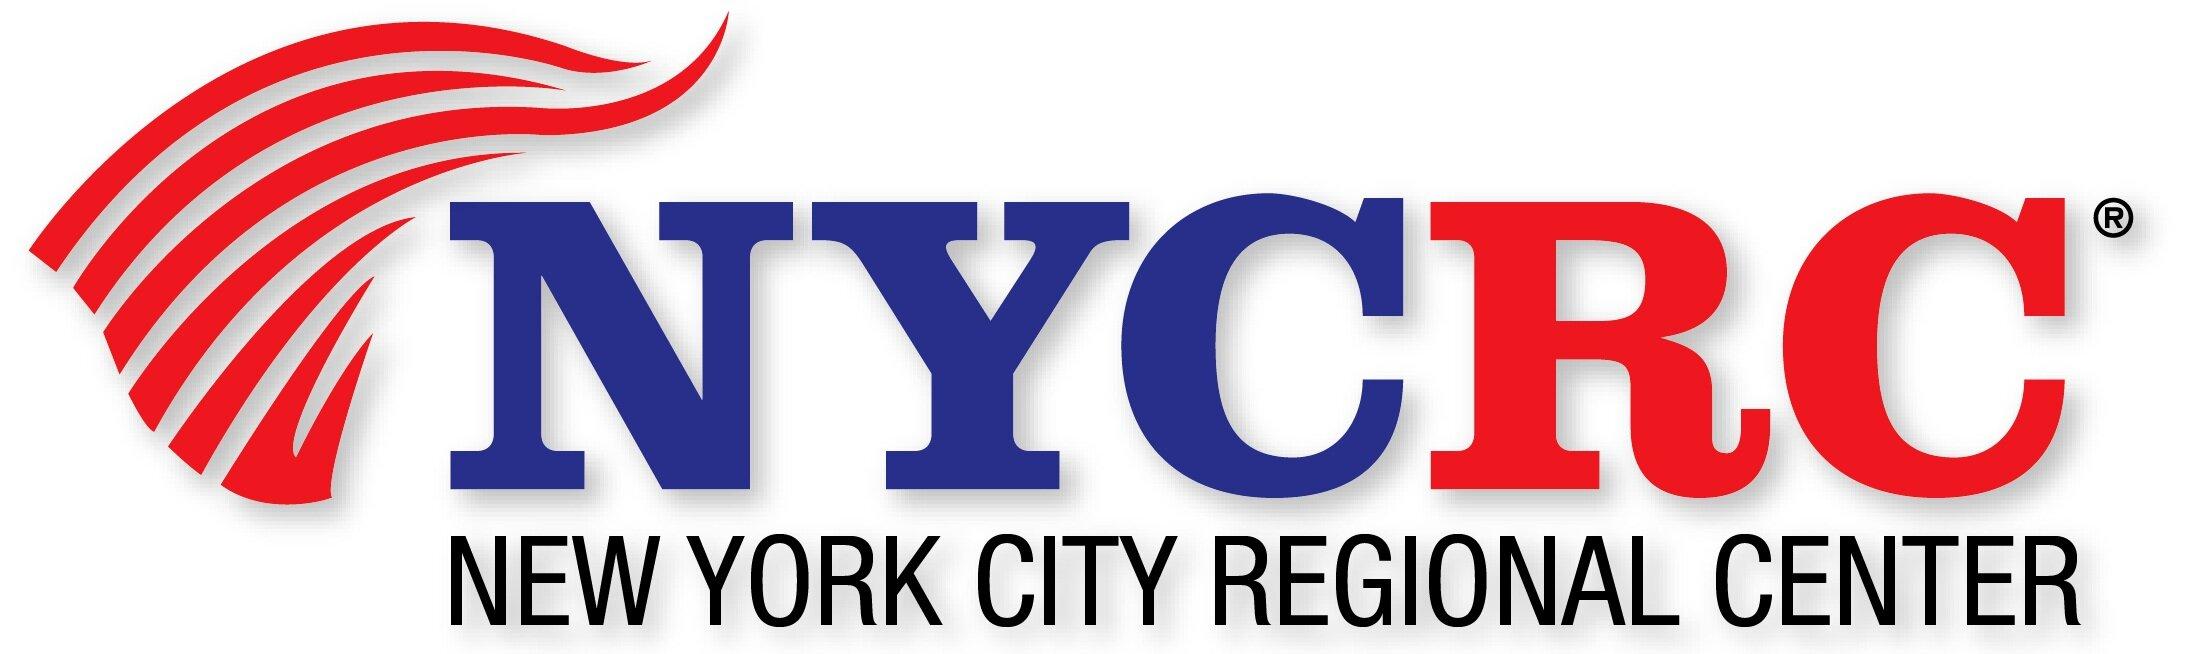 NYCRC_logo_HIRES_103114-black.jpg